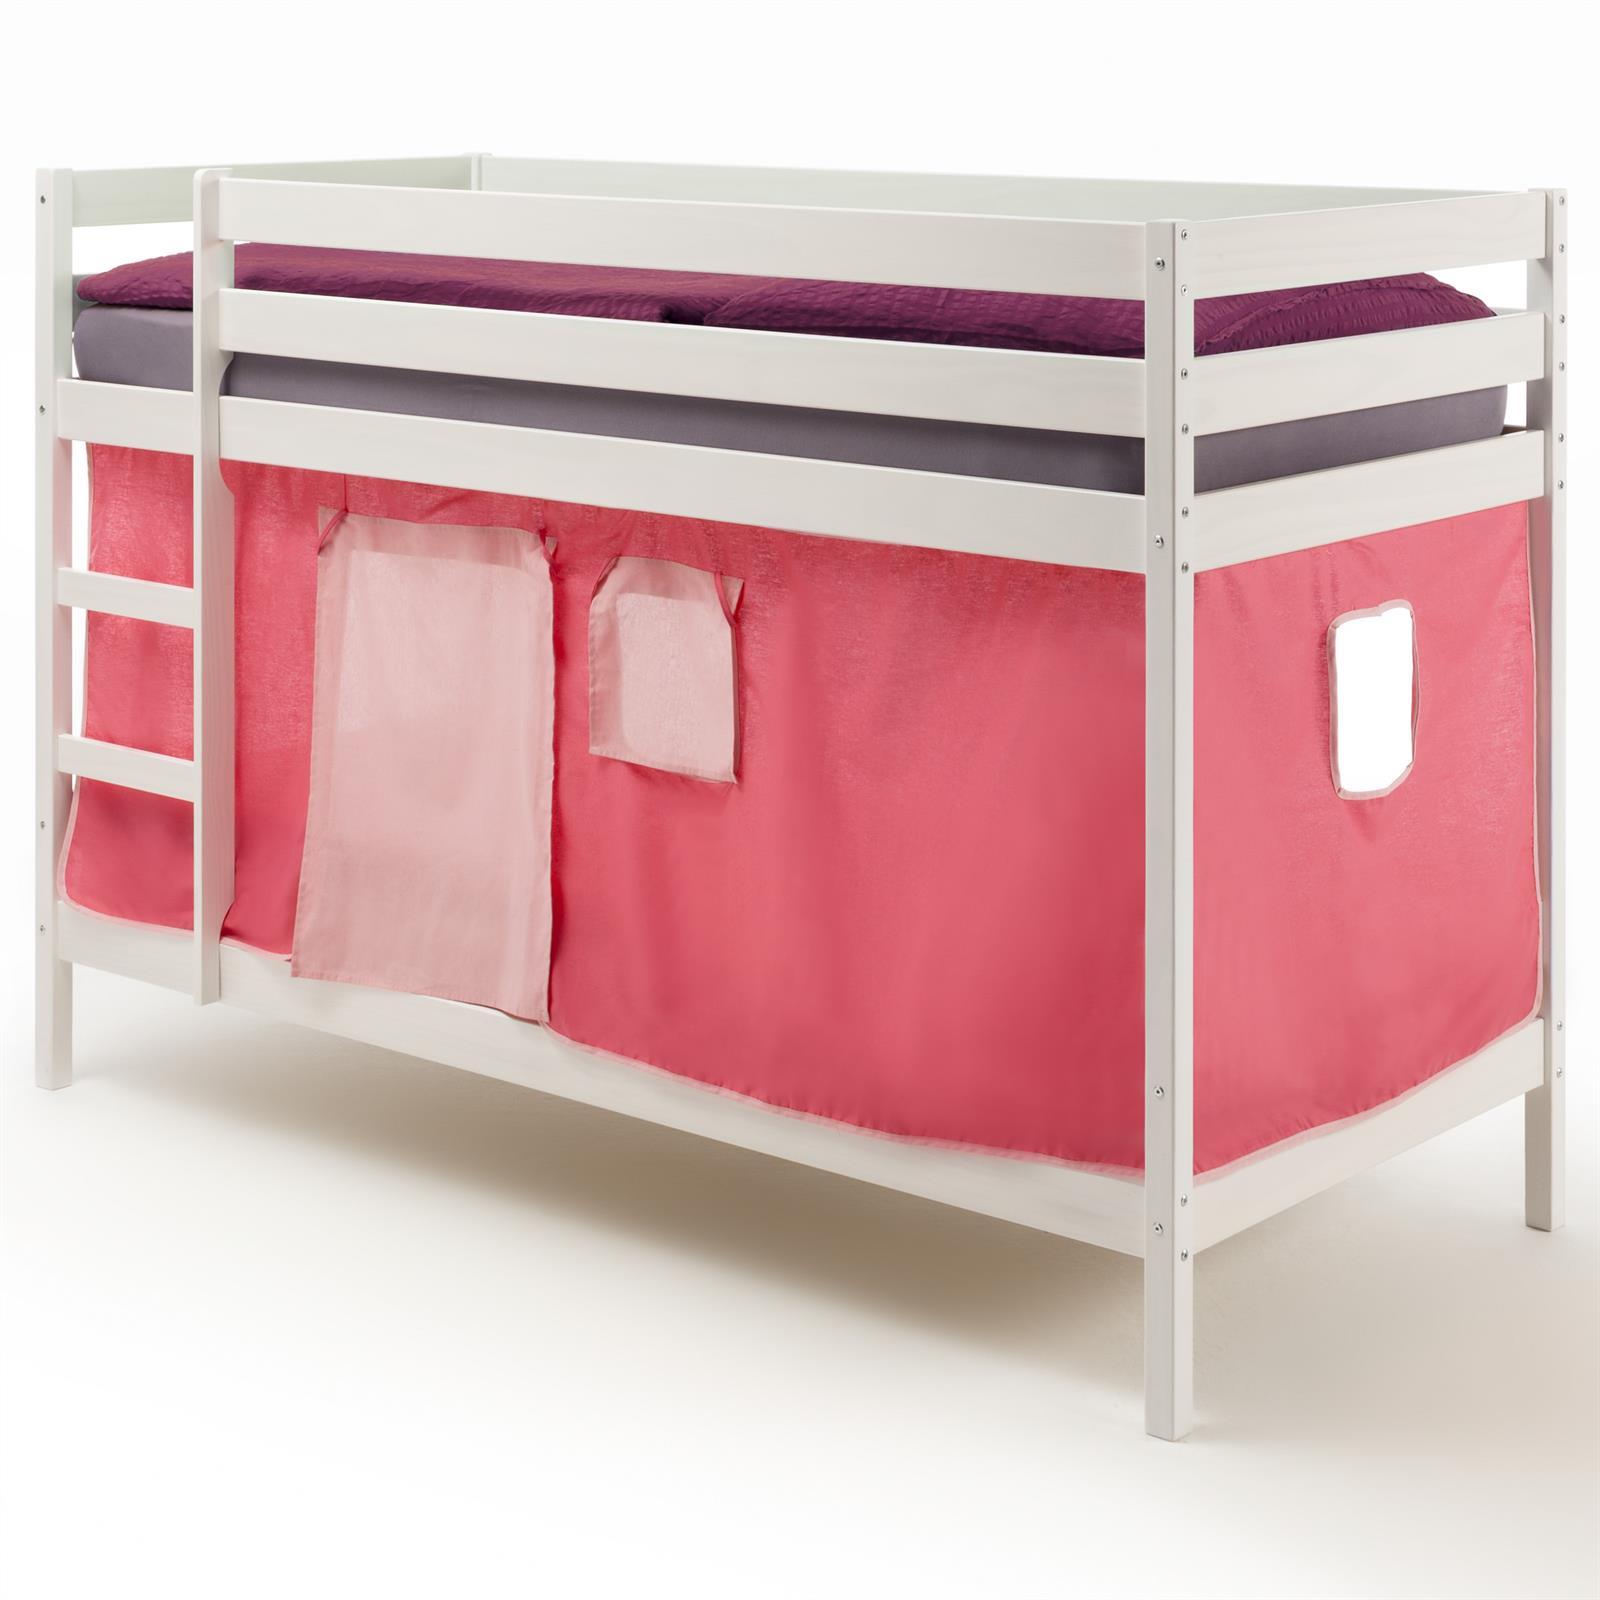 etagenbett felix in kiefer massiv wei mobilia24. Black Bedroom Furniture Sets. Home Design Ideas